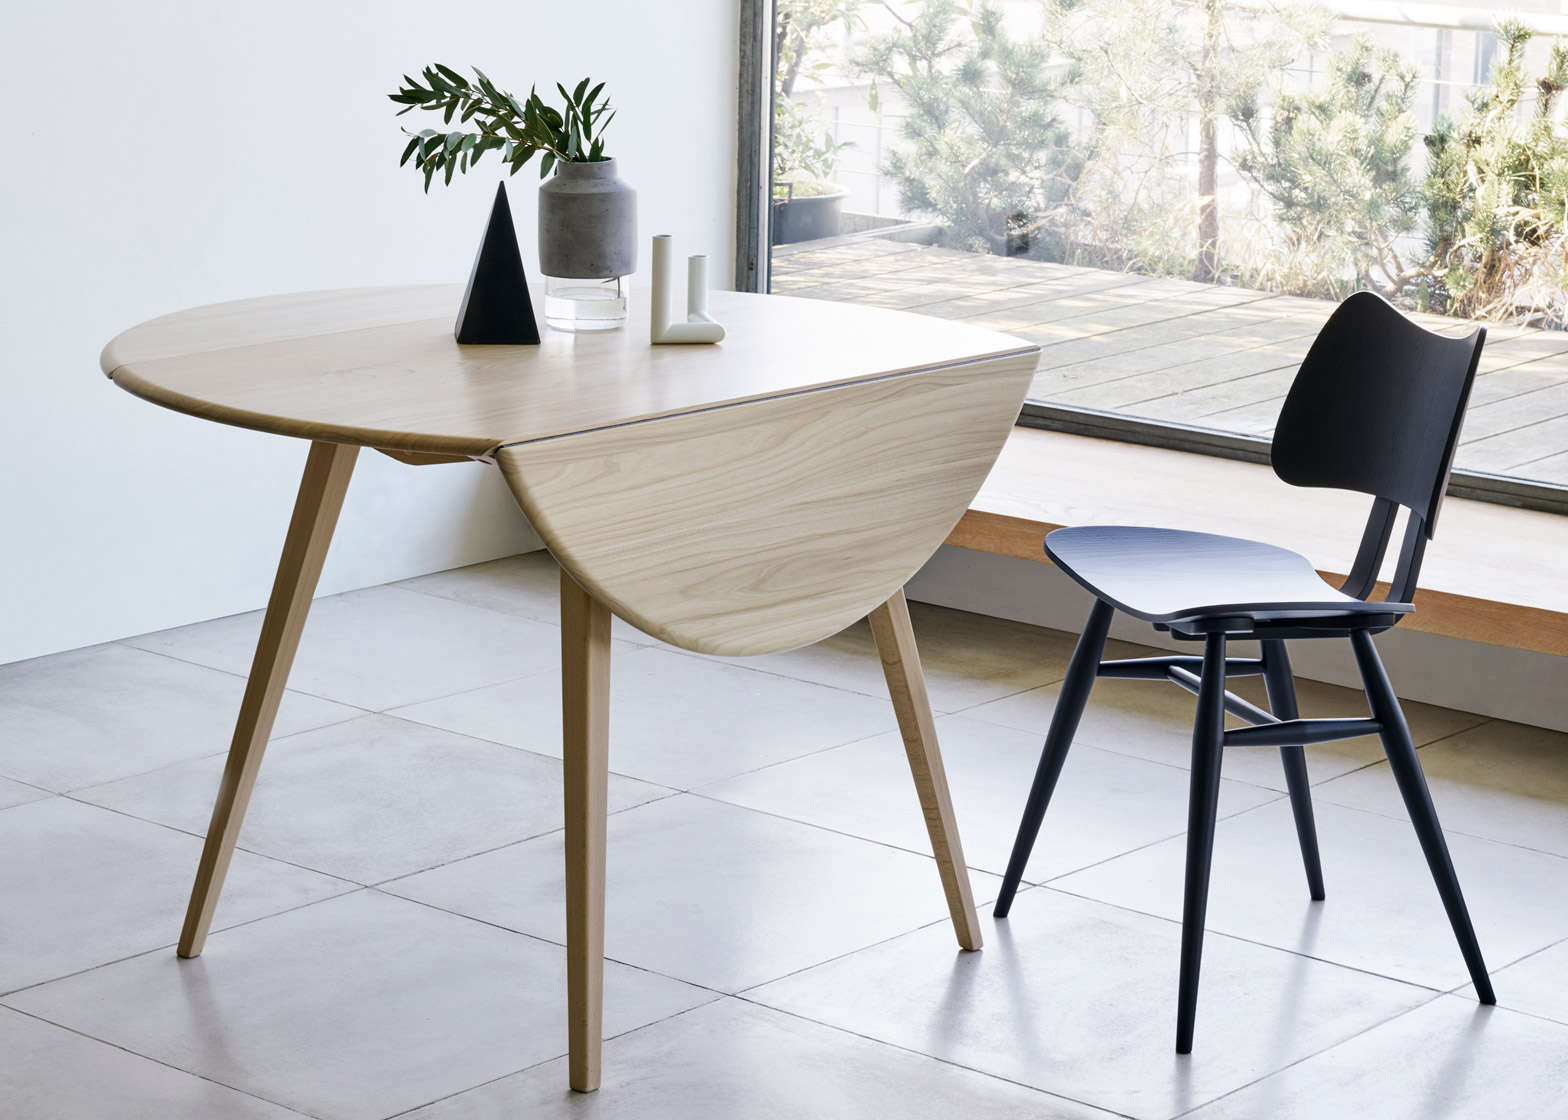 ercol-furniture-home-products-milan-design-week-2016_dezeen_1568_3